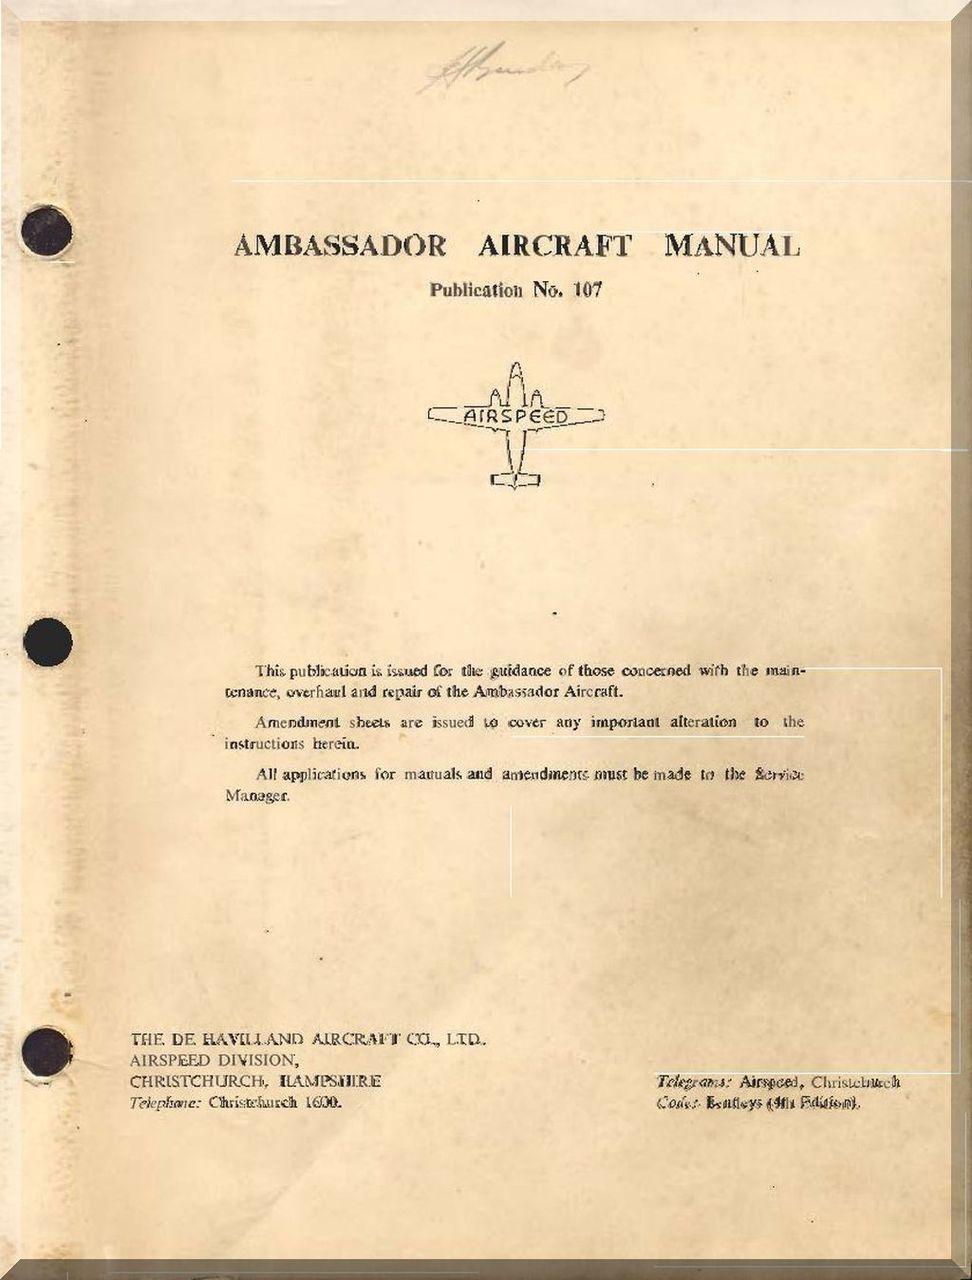 Airspeed ambassador aircraft flight manual aircraft aircraft malvernweather Image collections